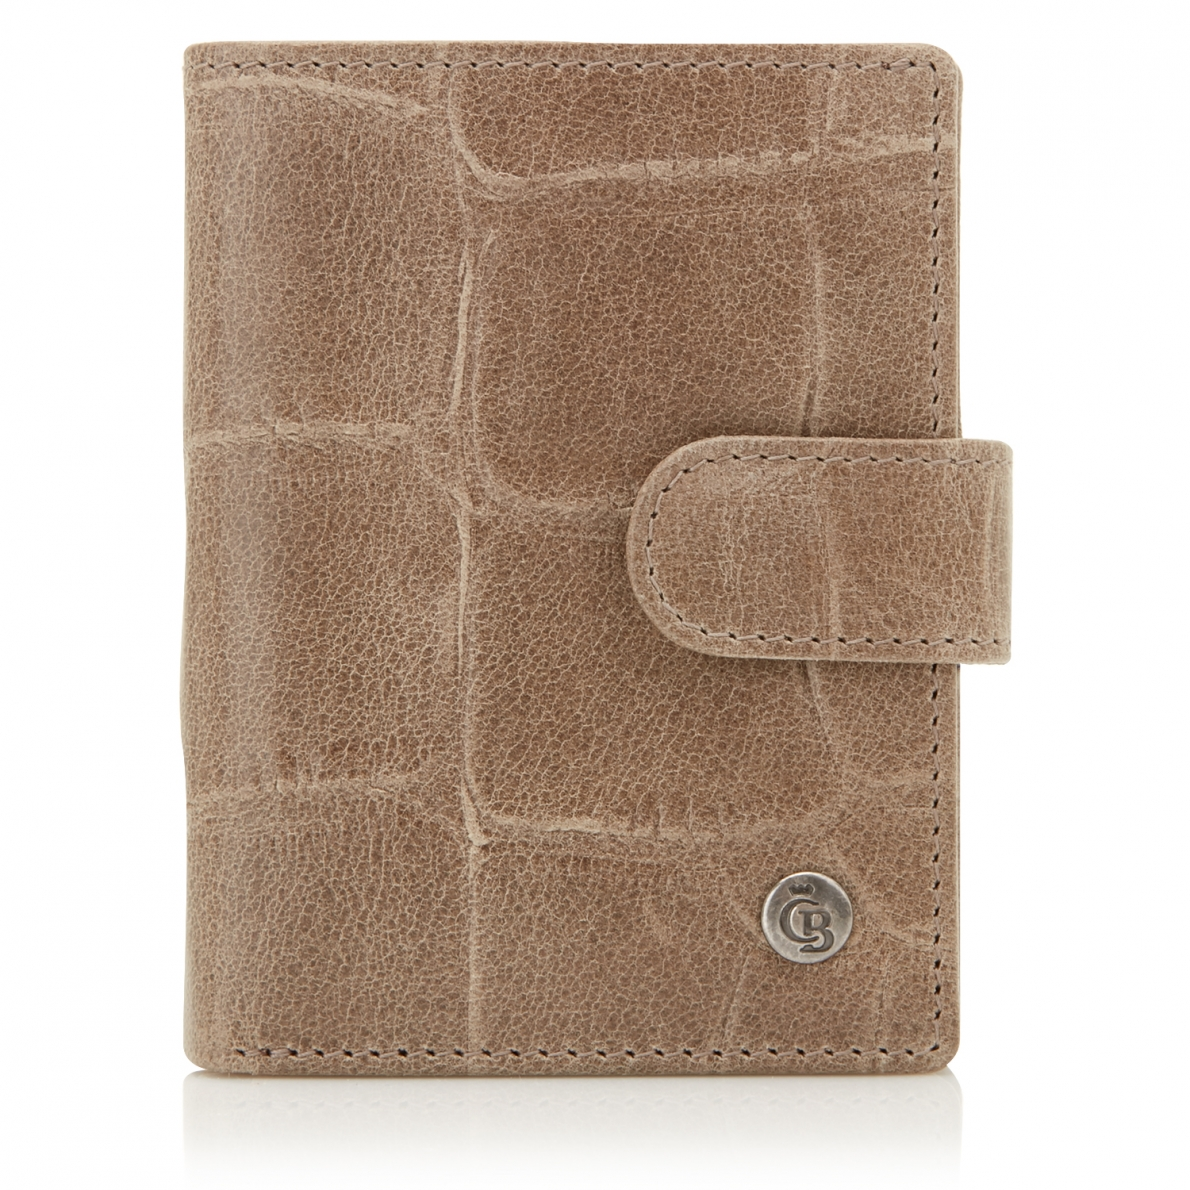 cbbb70aa47c Portemonnees | pasjes portemonnees en andere accessoires | i